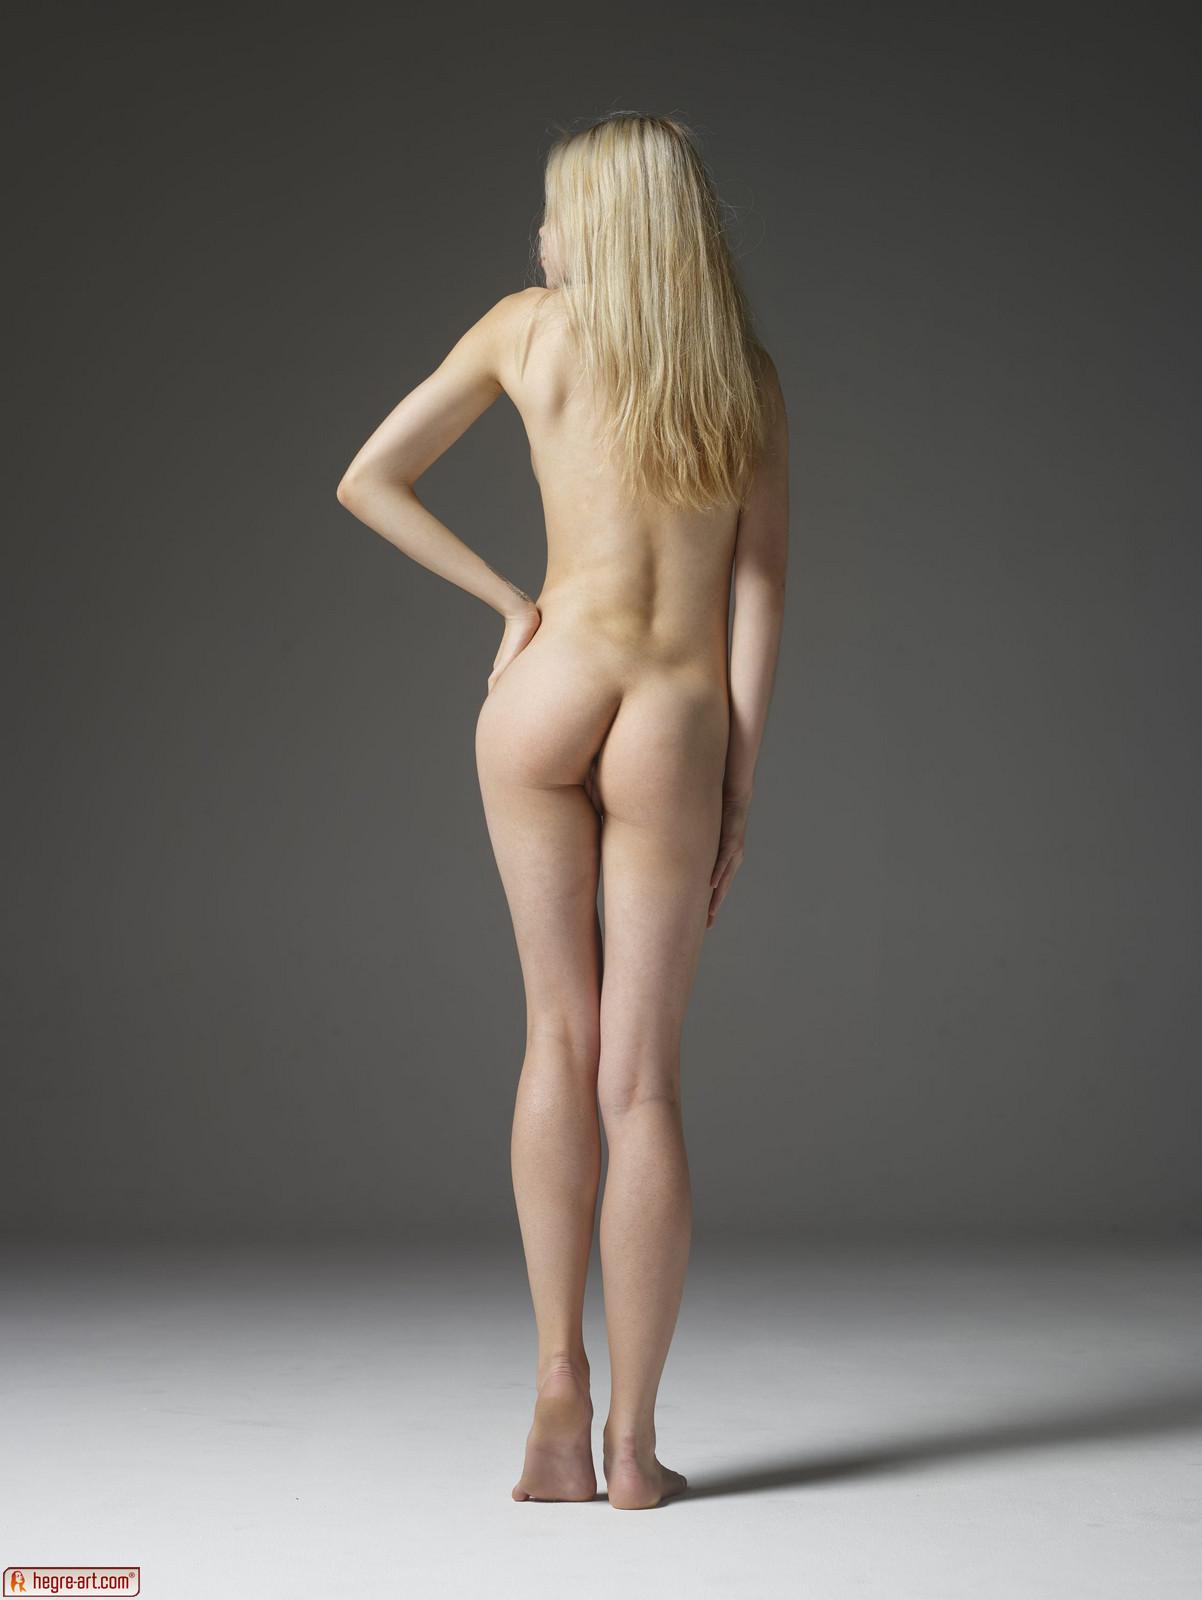 Art of nude ass pics jon